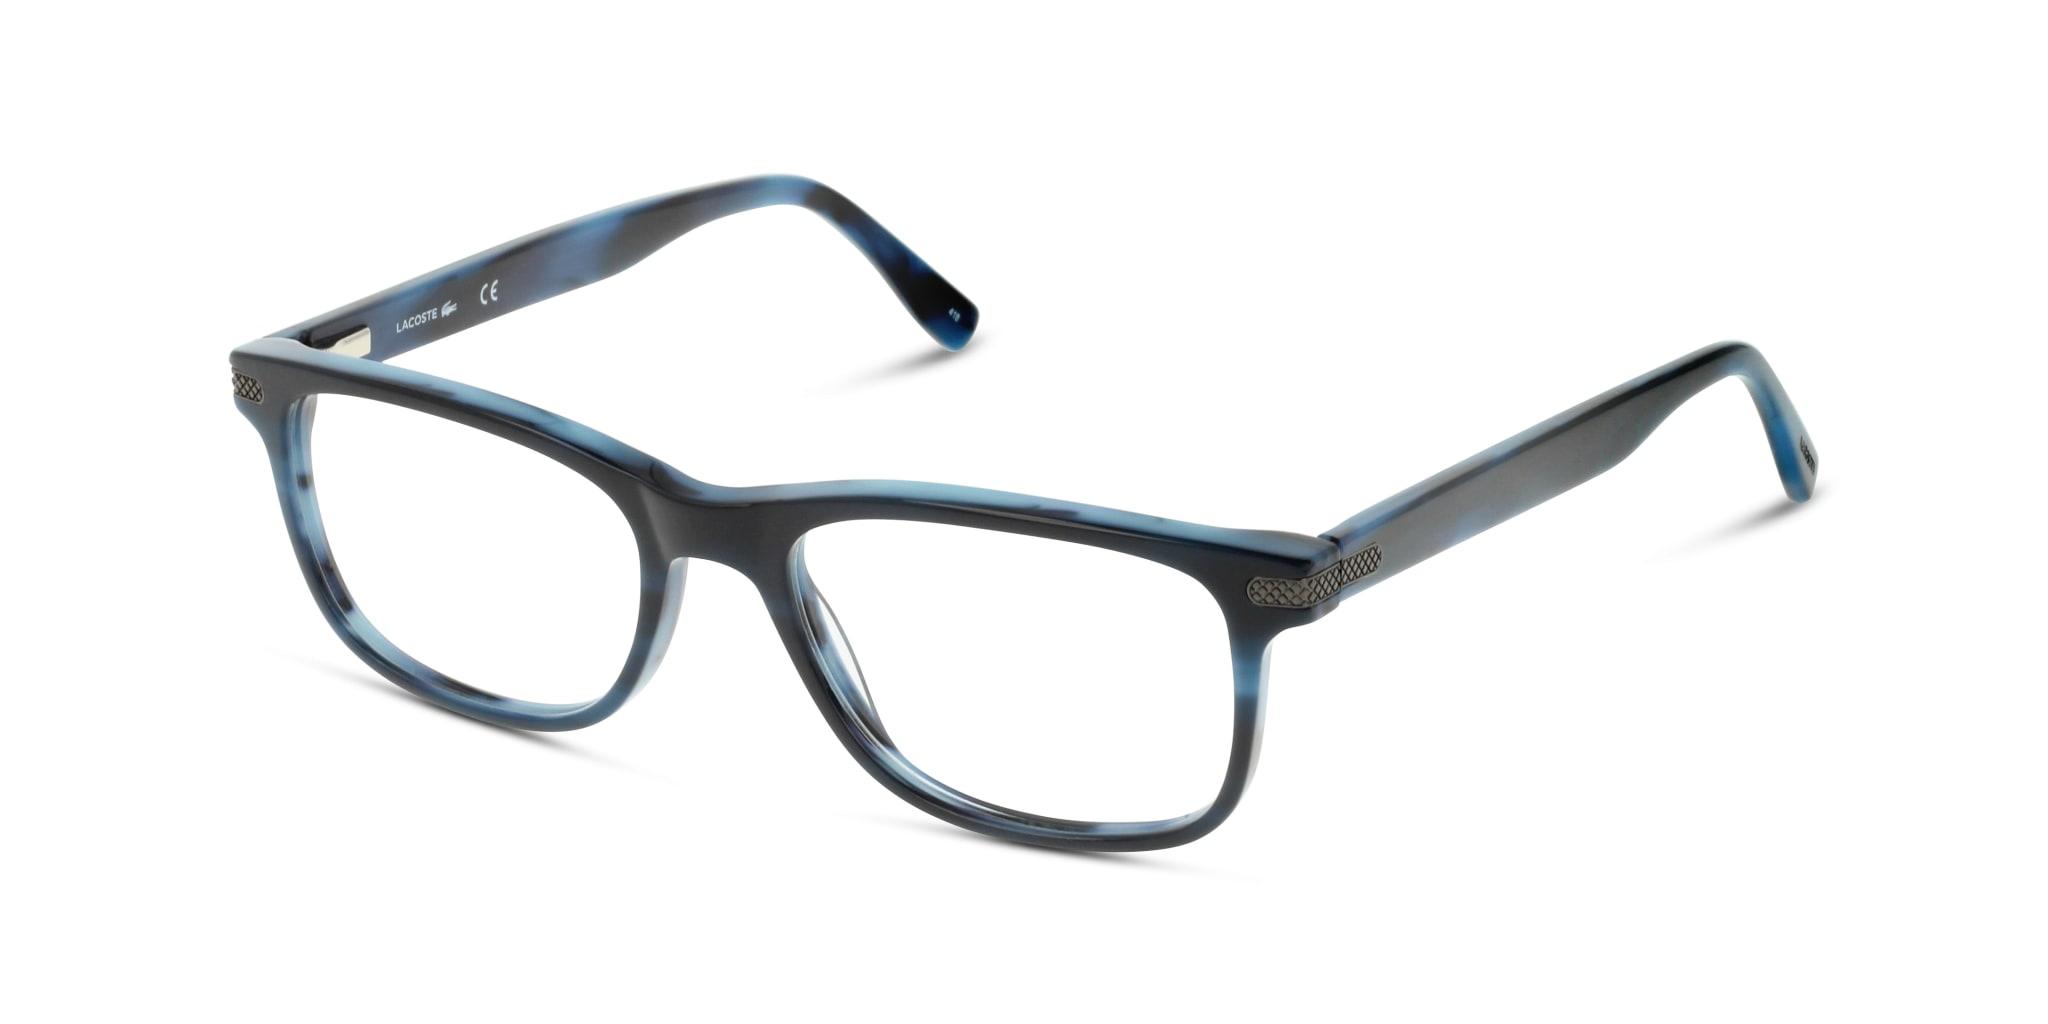 886895399302-angle-03-lacoste-l2841-eyewear-striped-blue